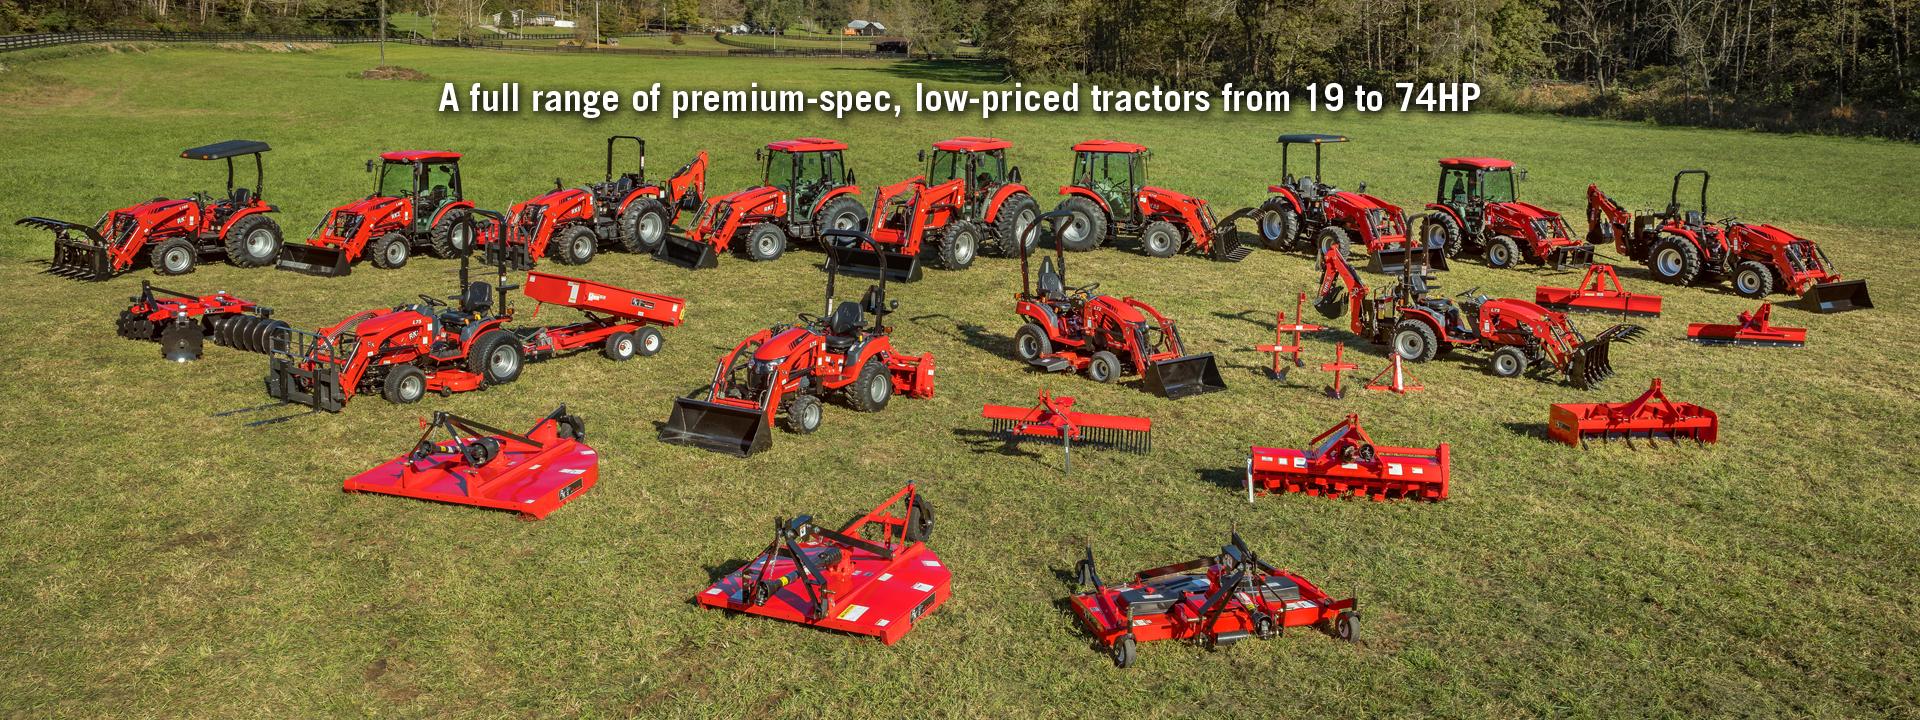 RK Tractors | More Tractor Less Price TM